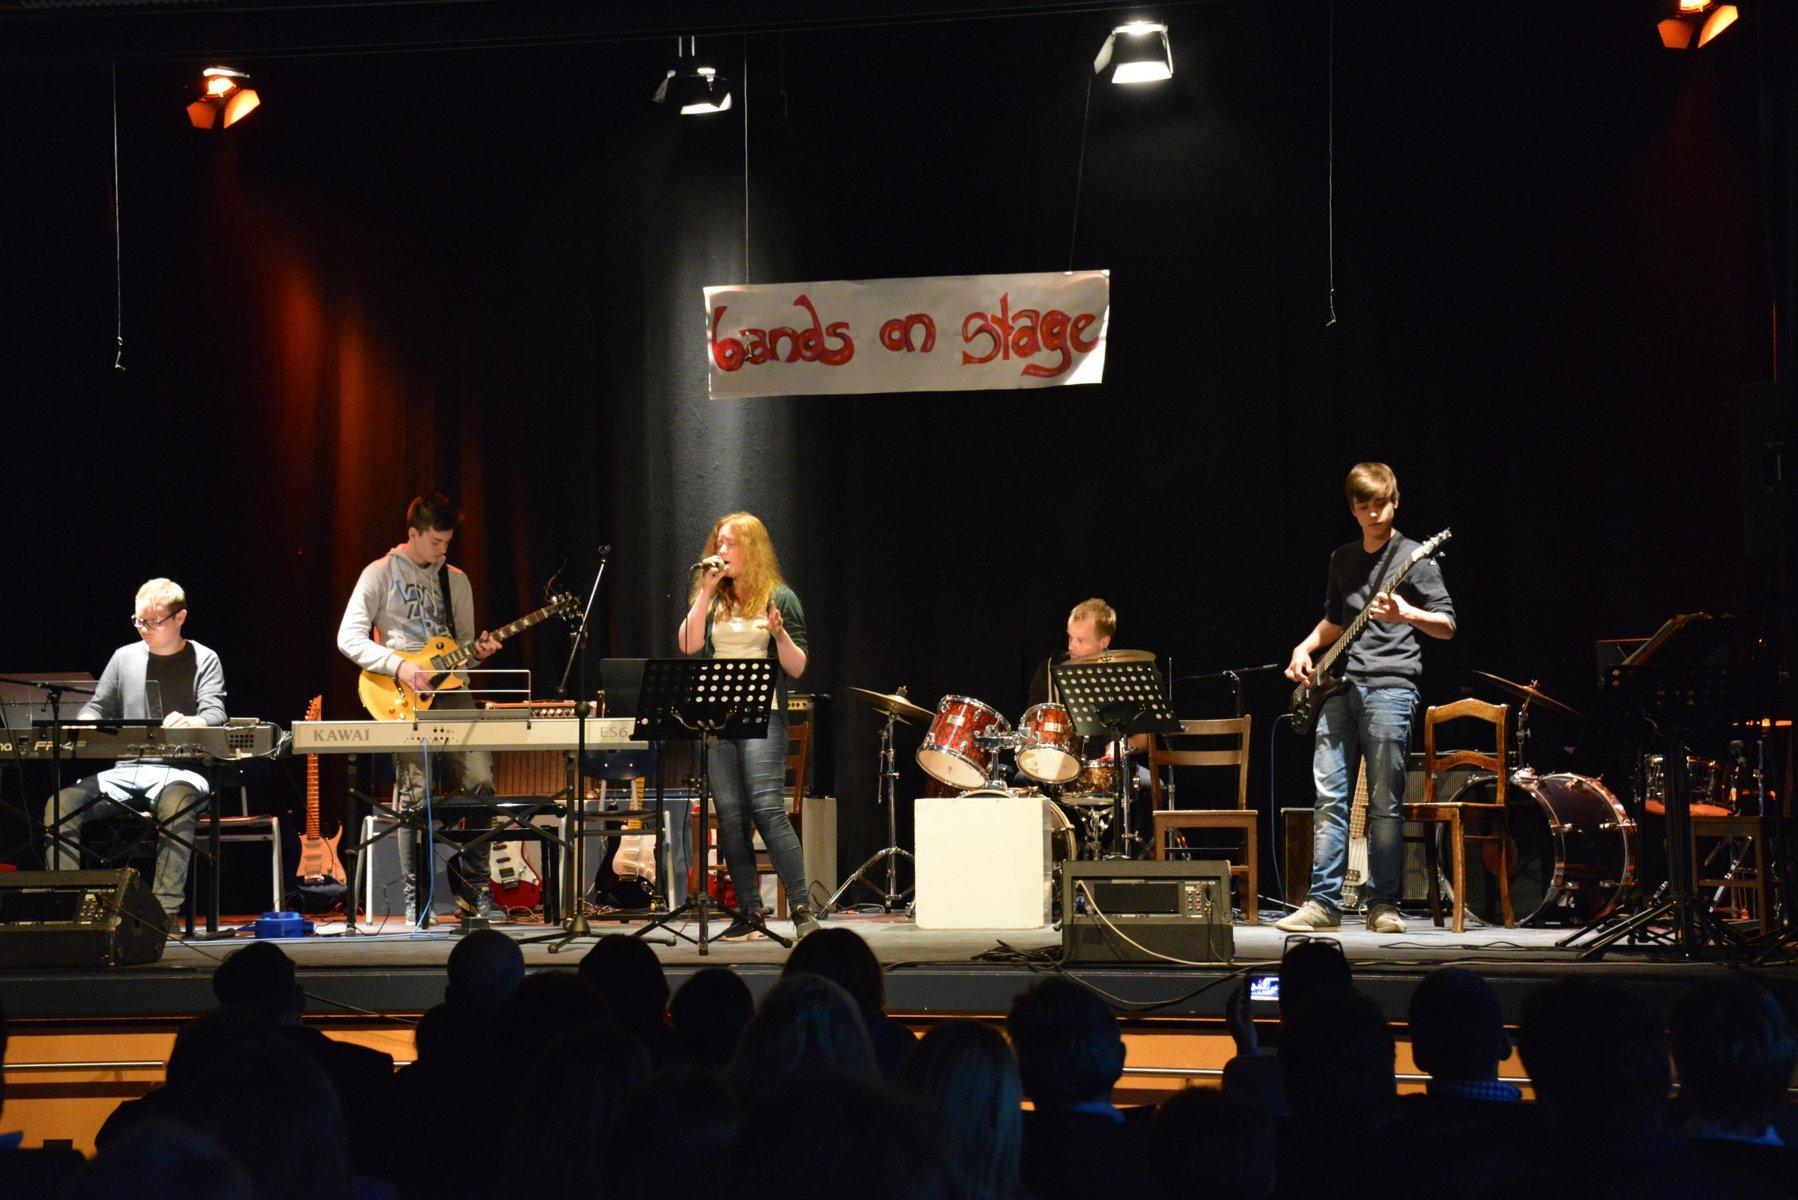 Couch Potatoes (Musikschule Marburg) Antonia Wetzlar (vocal)  Paul Naumann (keyboard)  Nils Schoormann (guitar)     Luka Batinic (bass) Benjamin Imhof (drums)